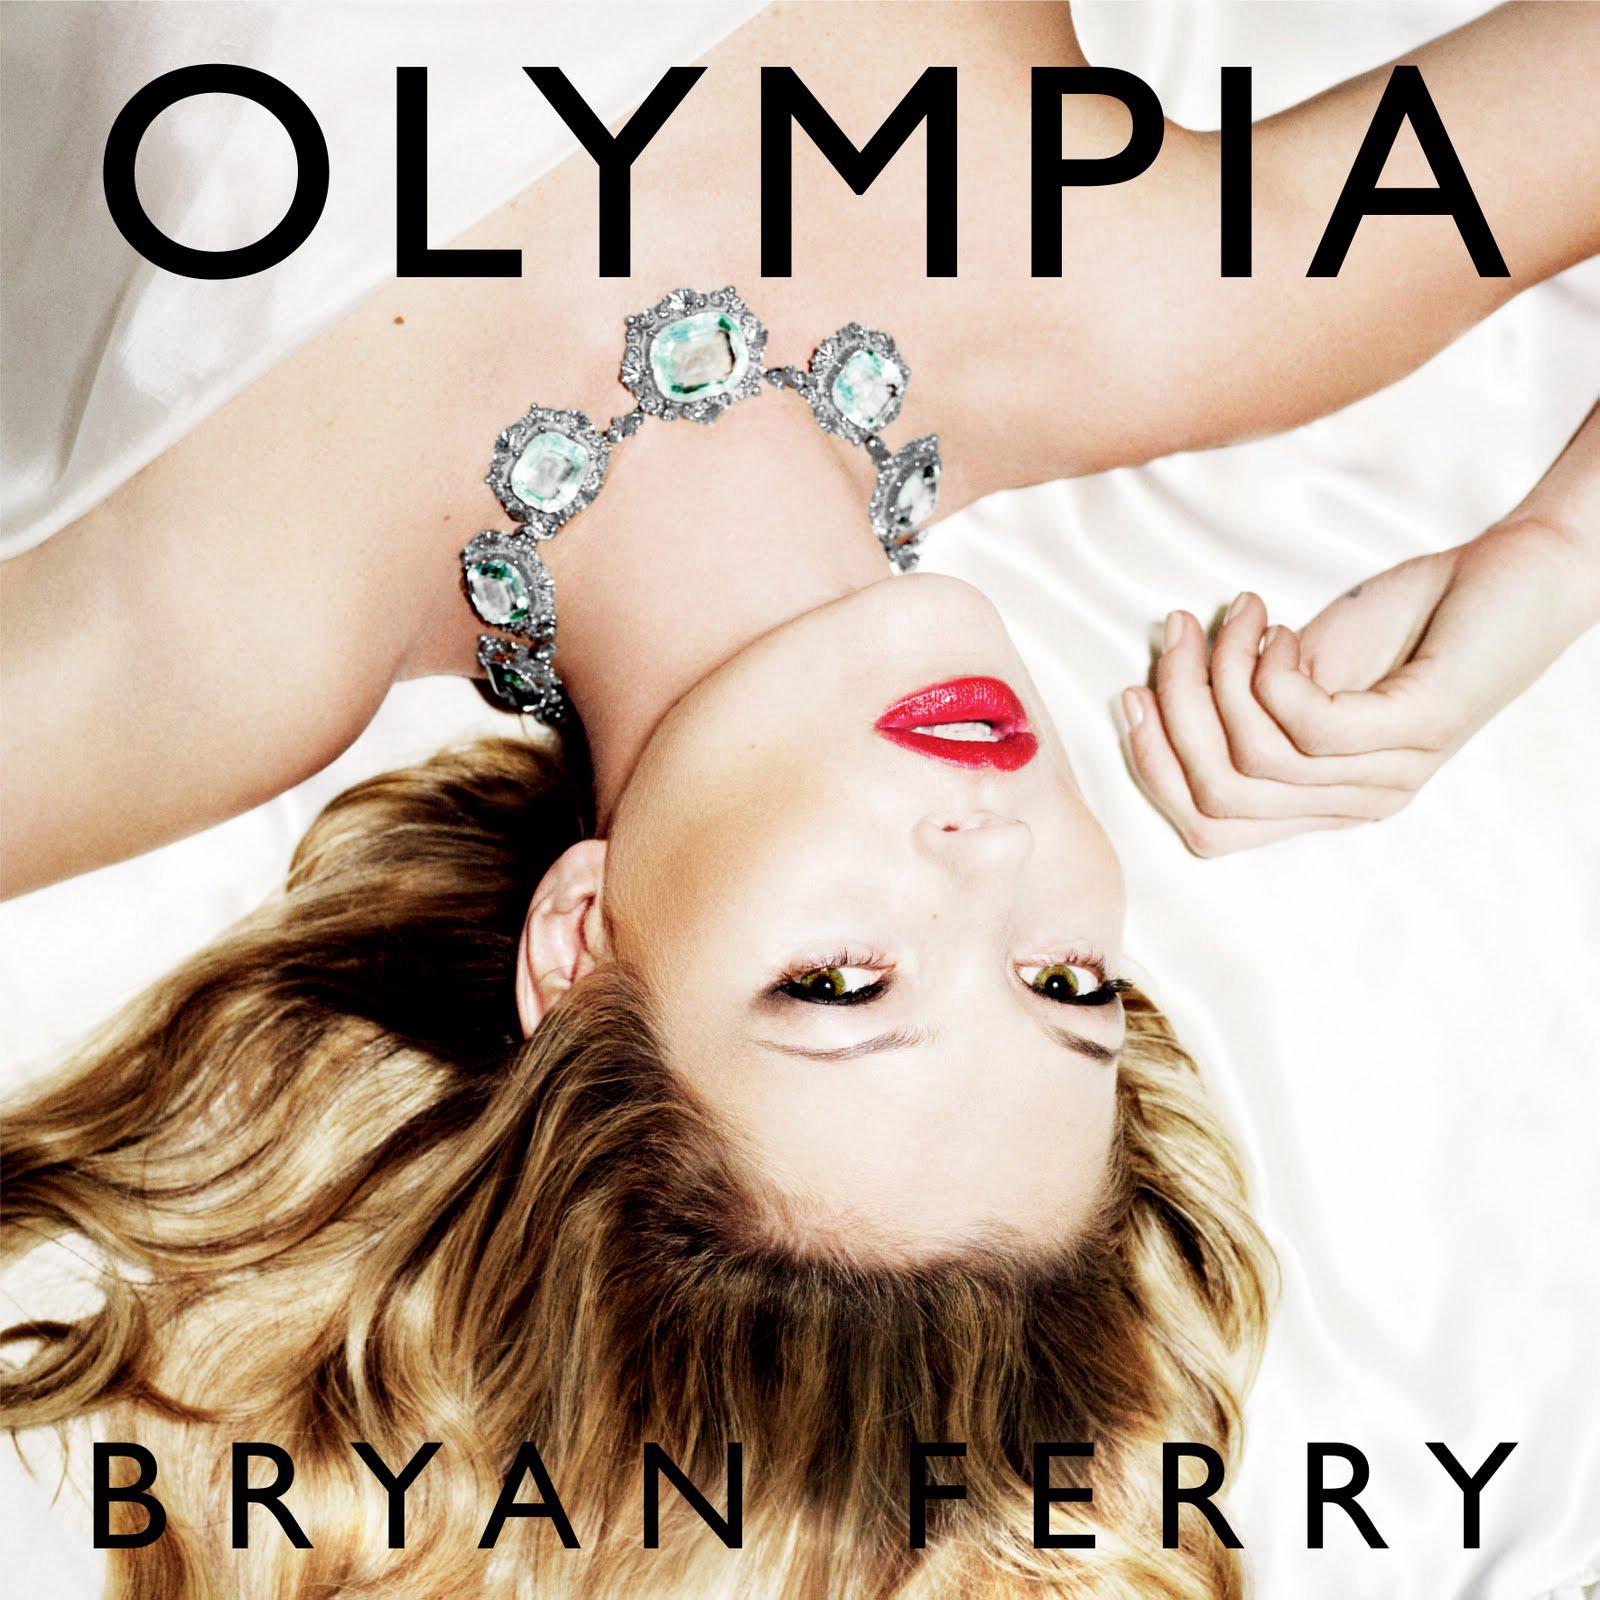 http://4.bp.blogspot.com/_T822rPXJtGU/TMj7GV9OKWI/AAAAAAAAAmc/JIyLYzqmSVE/s1600/Kate+Moss+by+Adam+Whitehead+for+Bryan+Ferry%27s+Olympia+album_cover.jpg